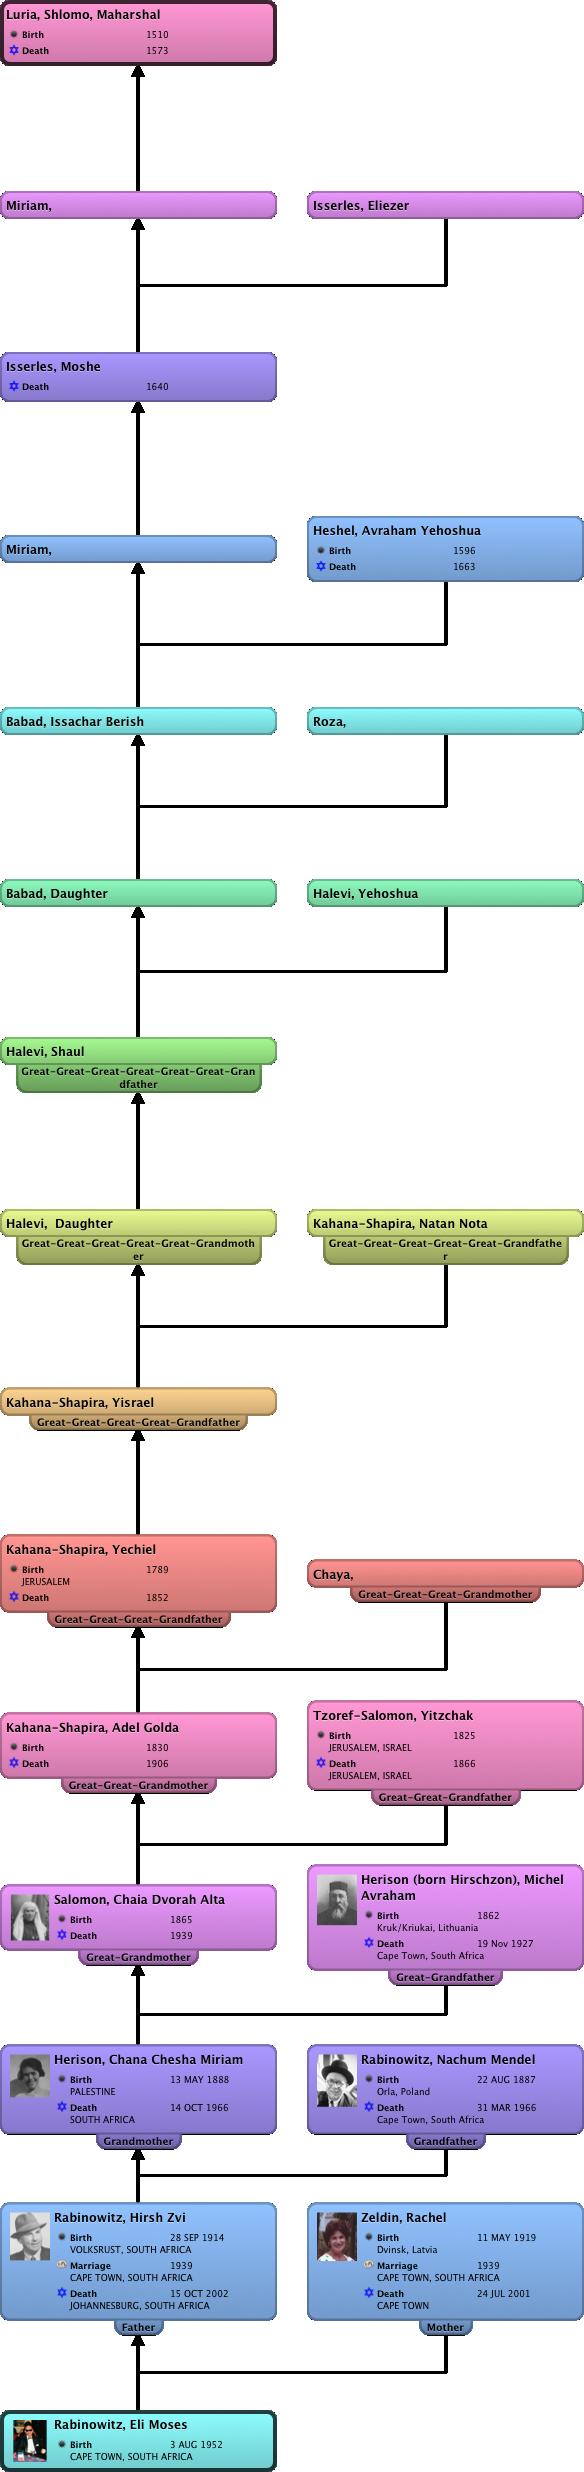 Relationship Chart Rabinowitz, Eli Moses :Luria, Shlomo, Maharshal